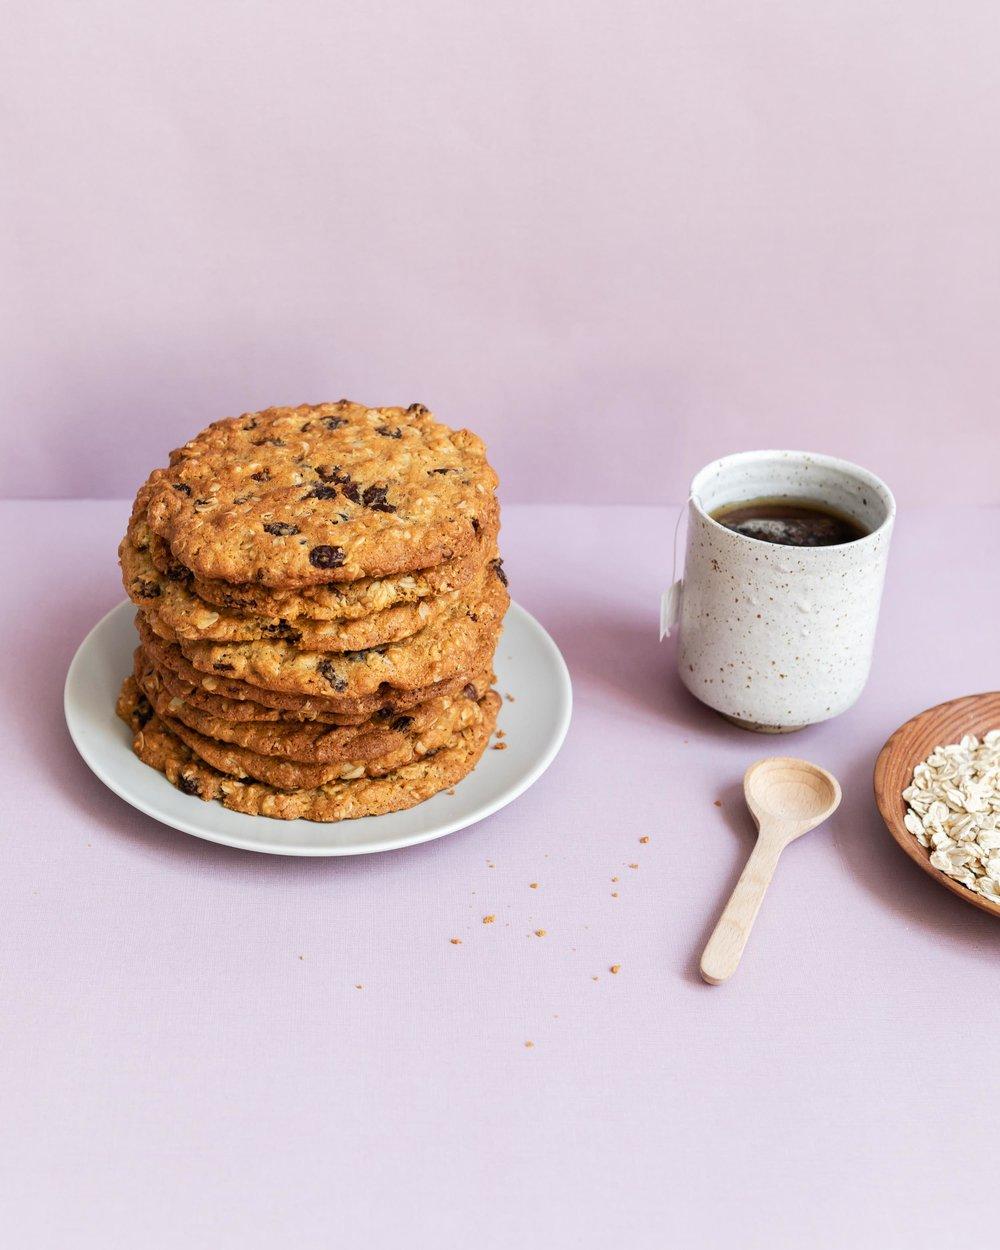 brittons bakery | verdenius | 143A0581.jpg